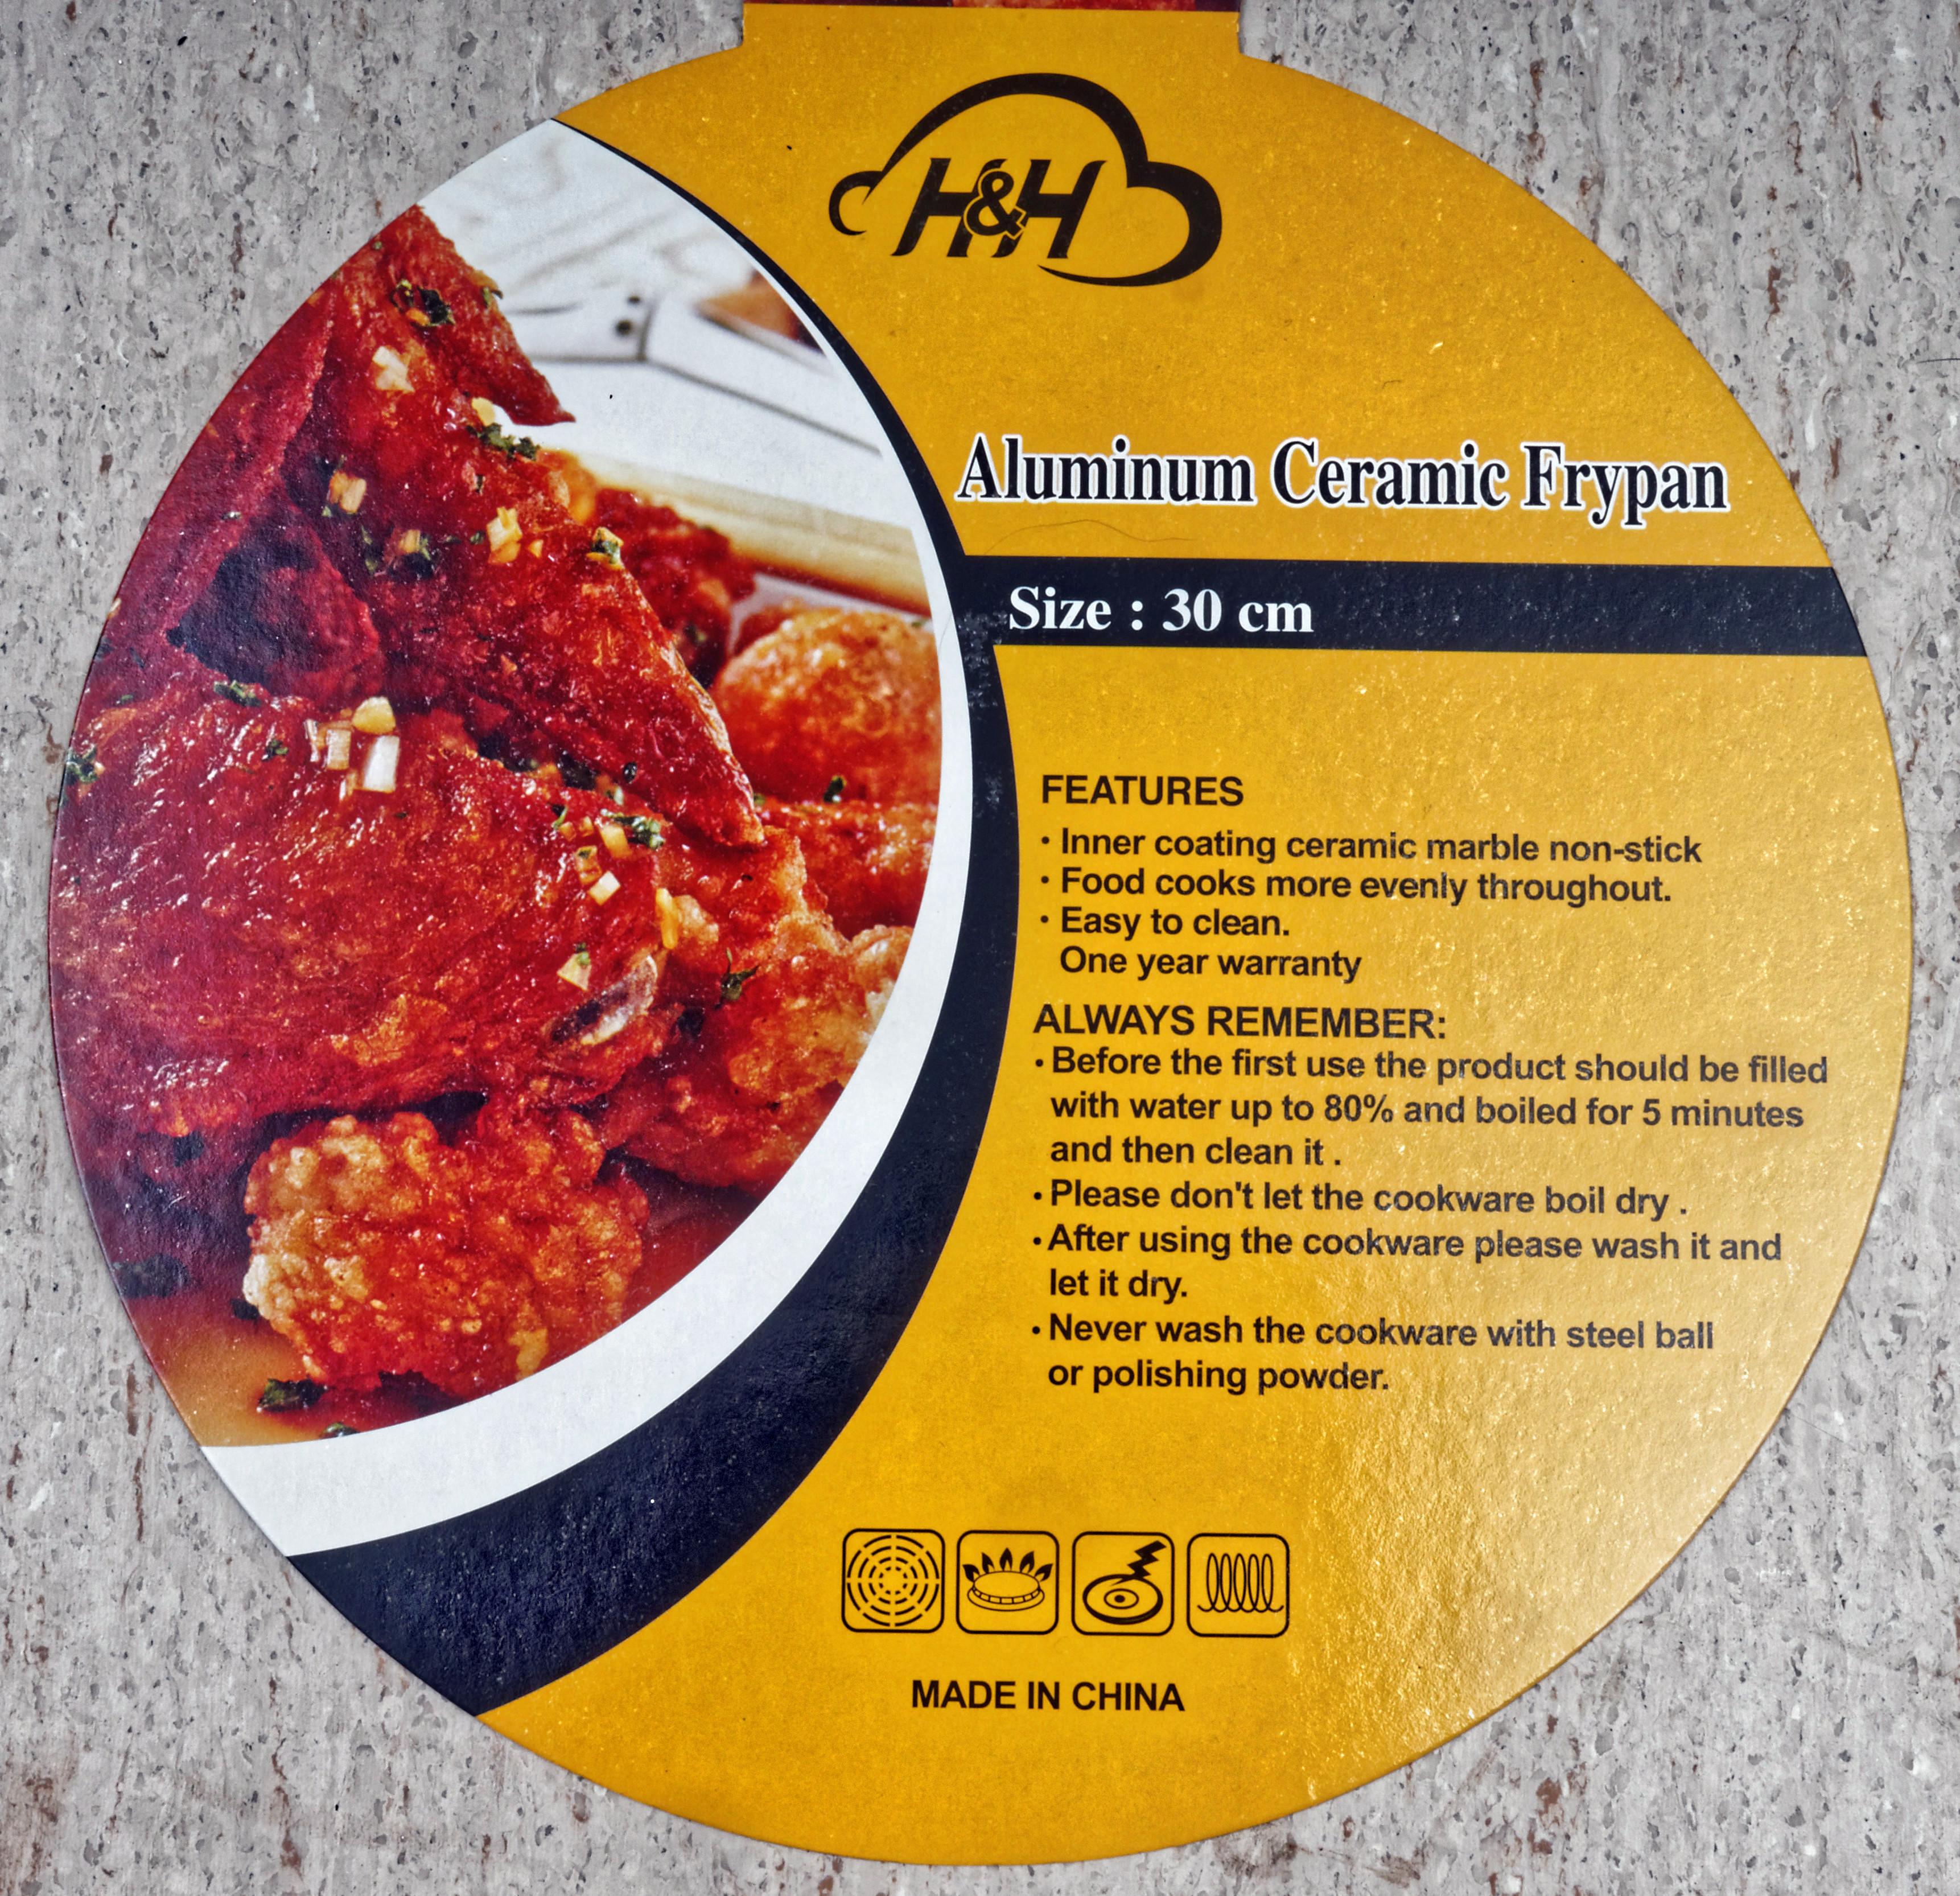 Frying-pan-description-2.jpeg